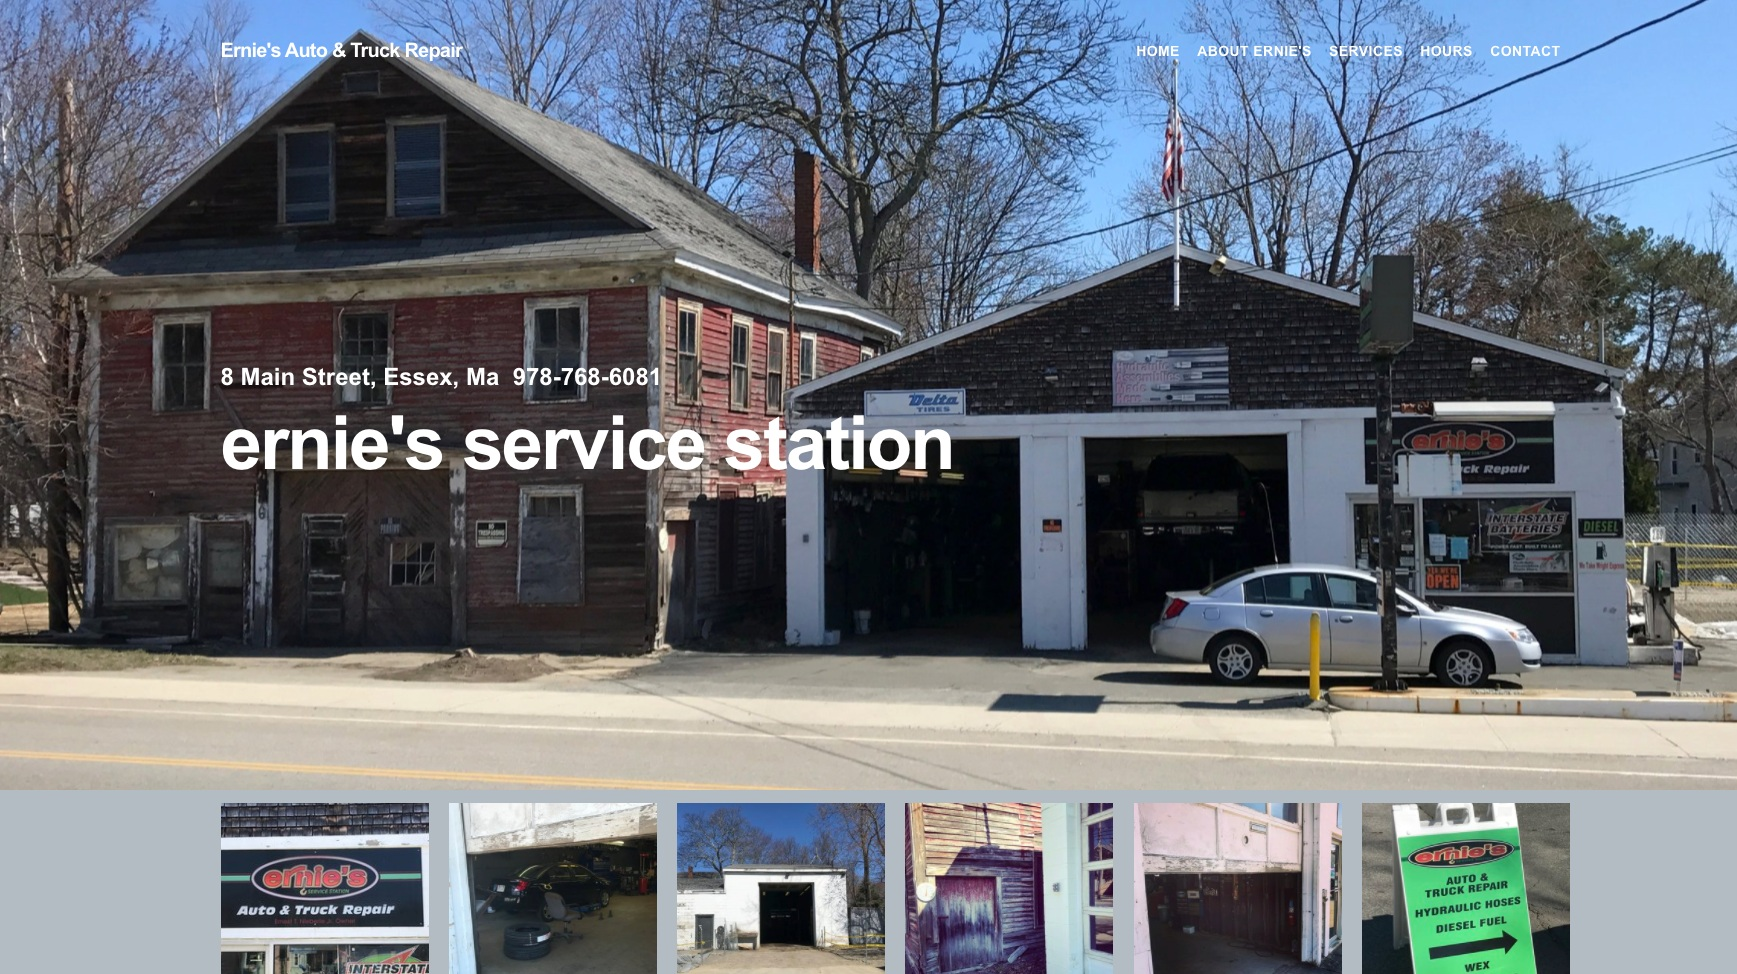 Ernie's Service Station